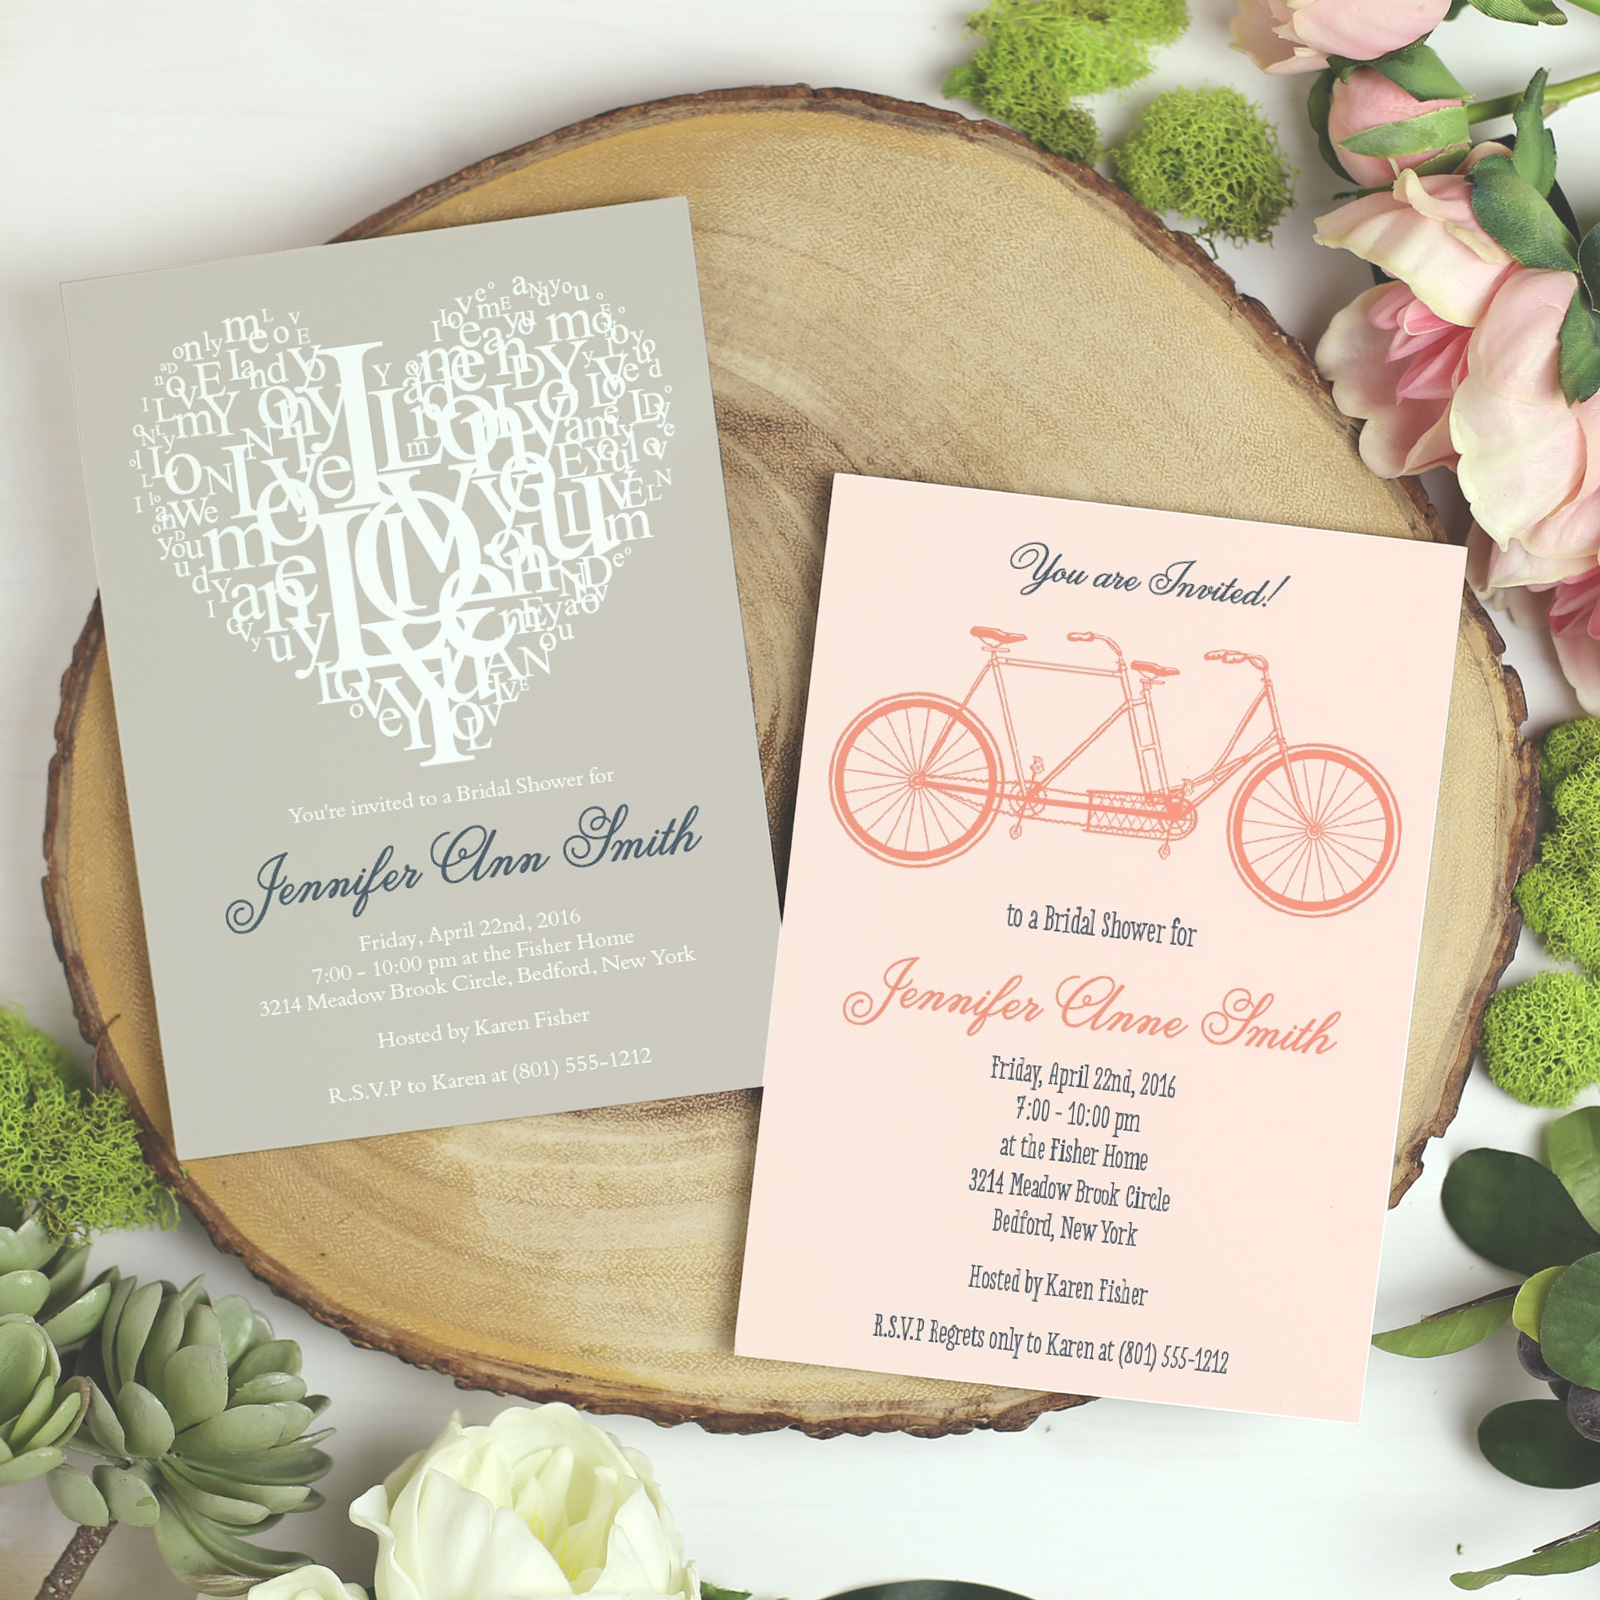 Wedding Invite Cards: Most Stylish Wedding Invitation Cards To Buy- Best Designs